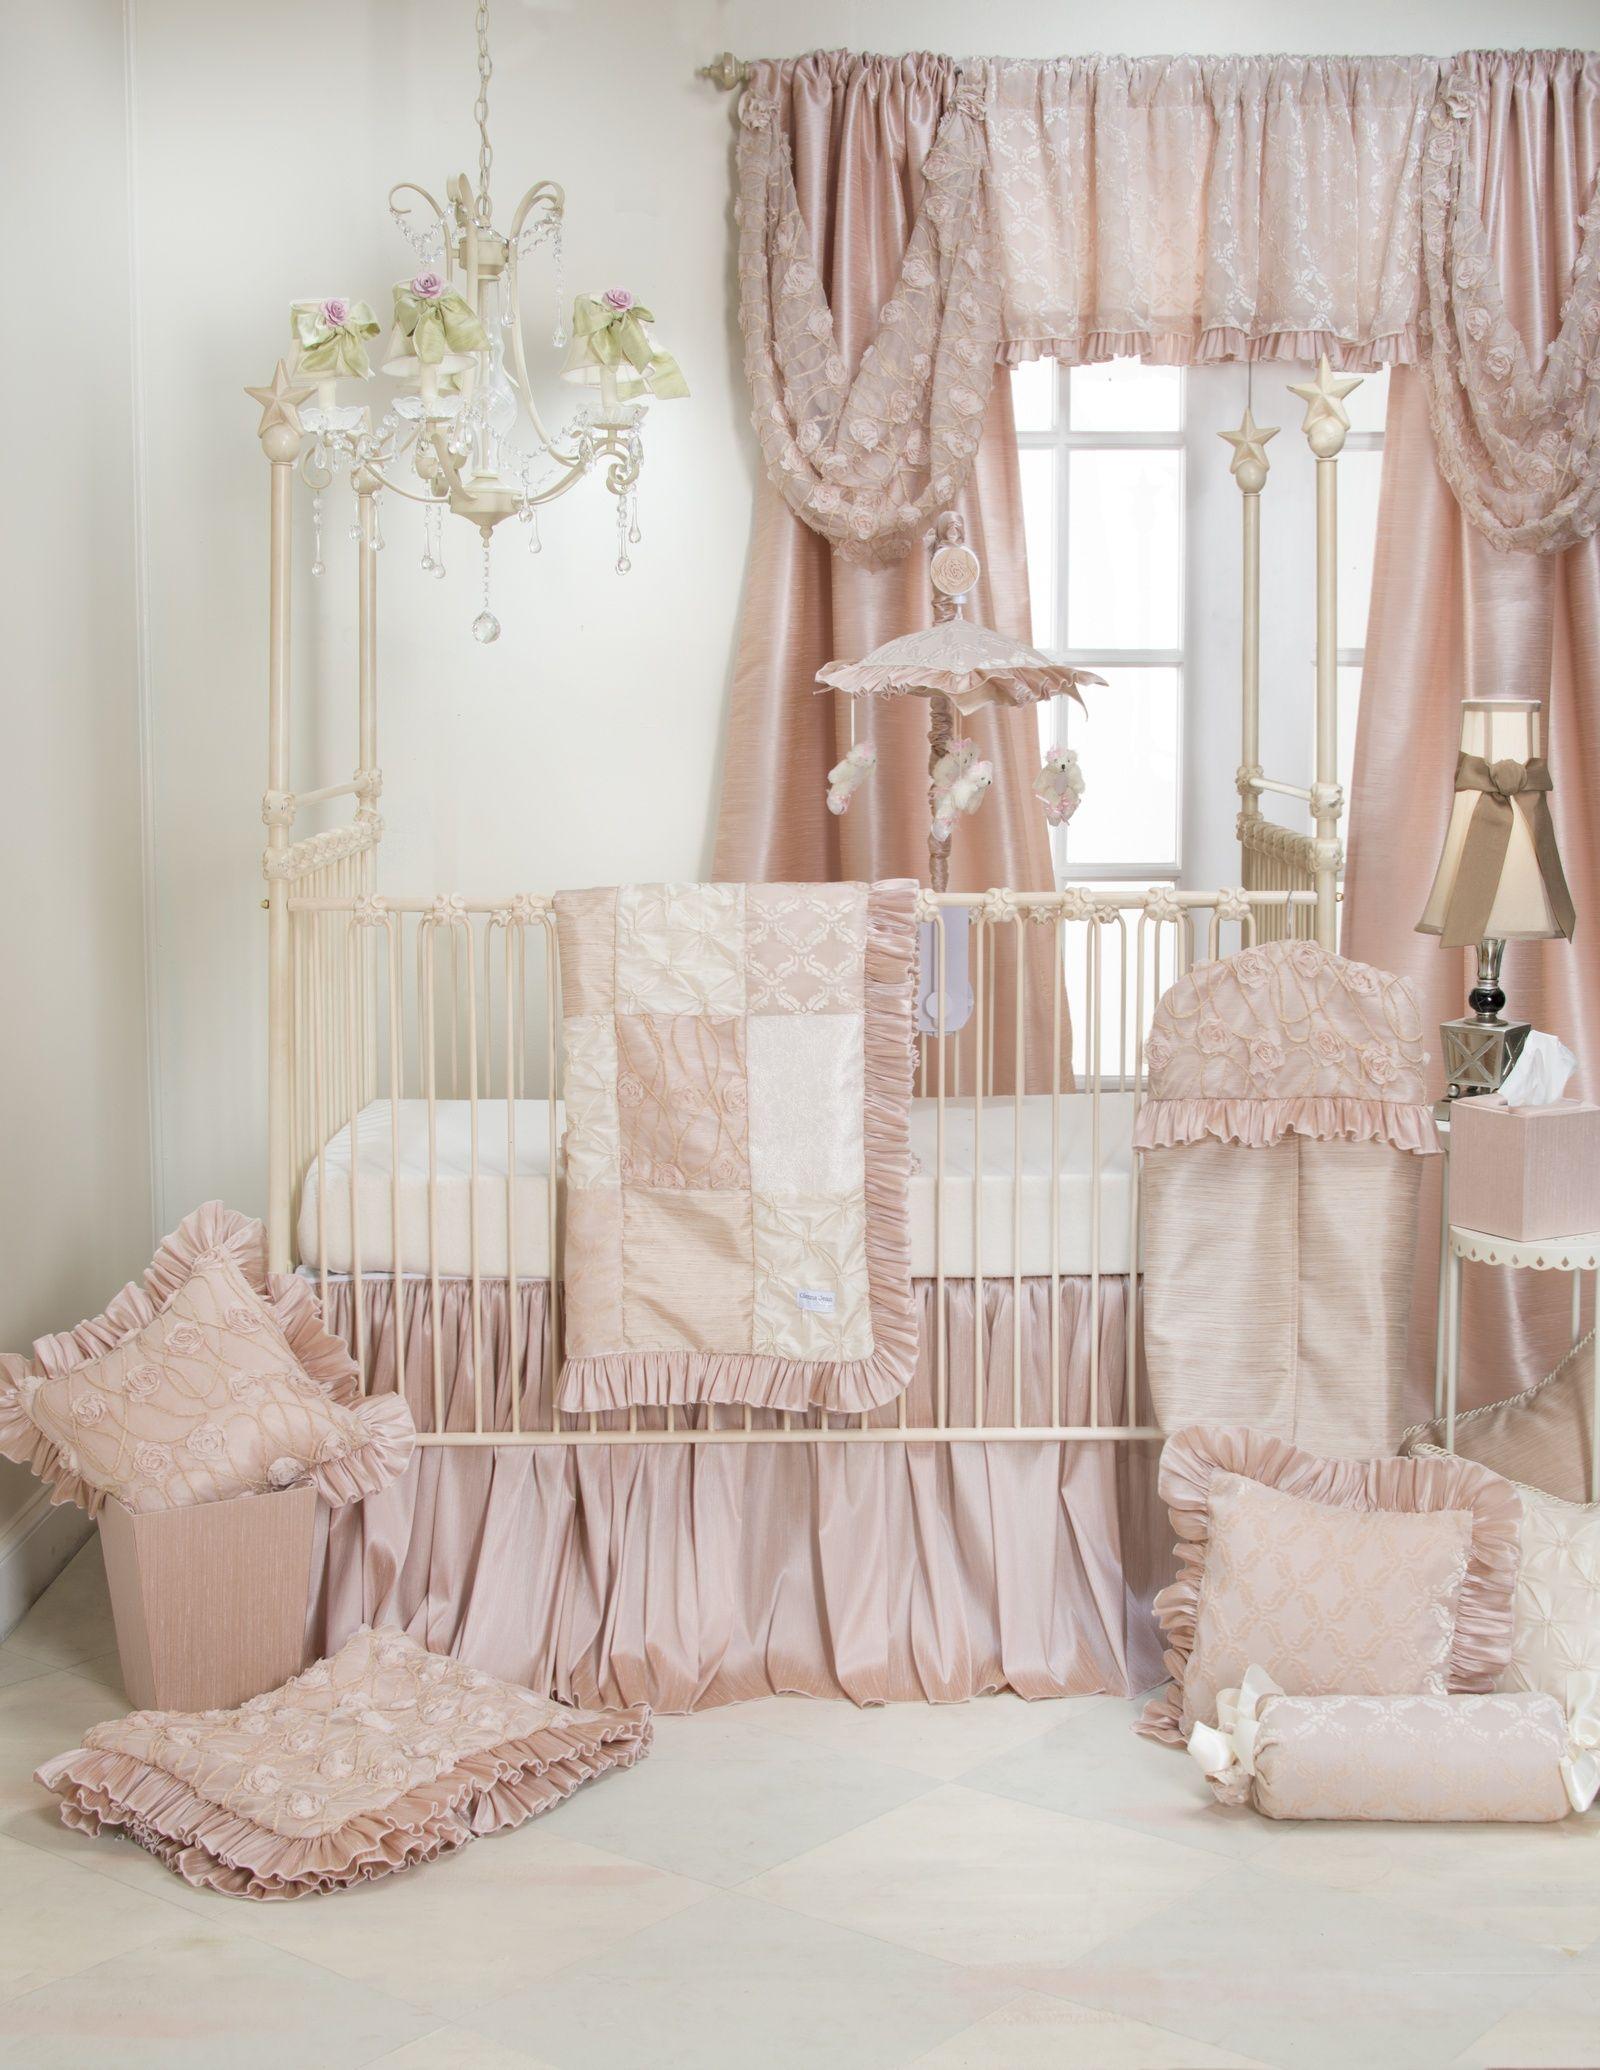 Paris Crib Bedding Set By Glenna Jean Is The BEST